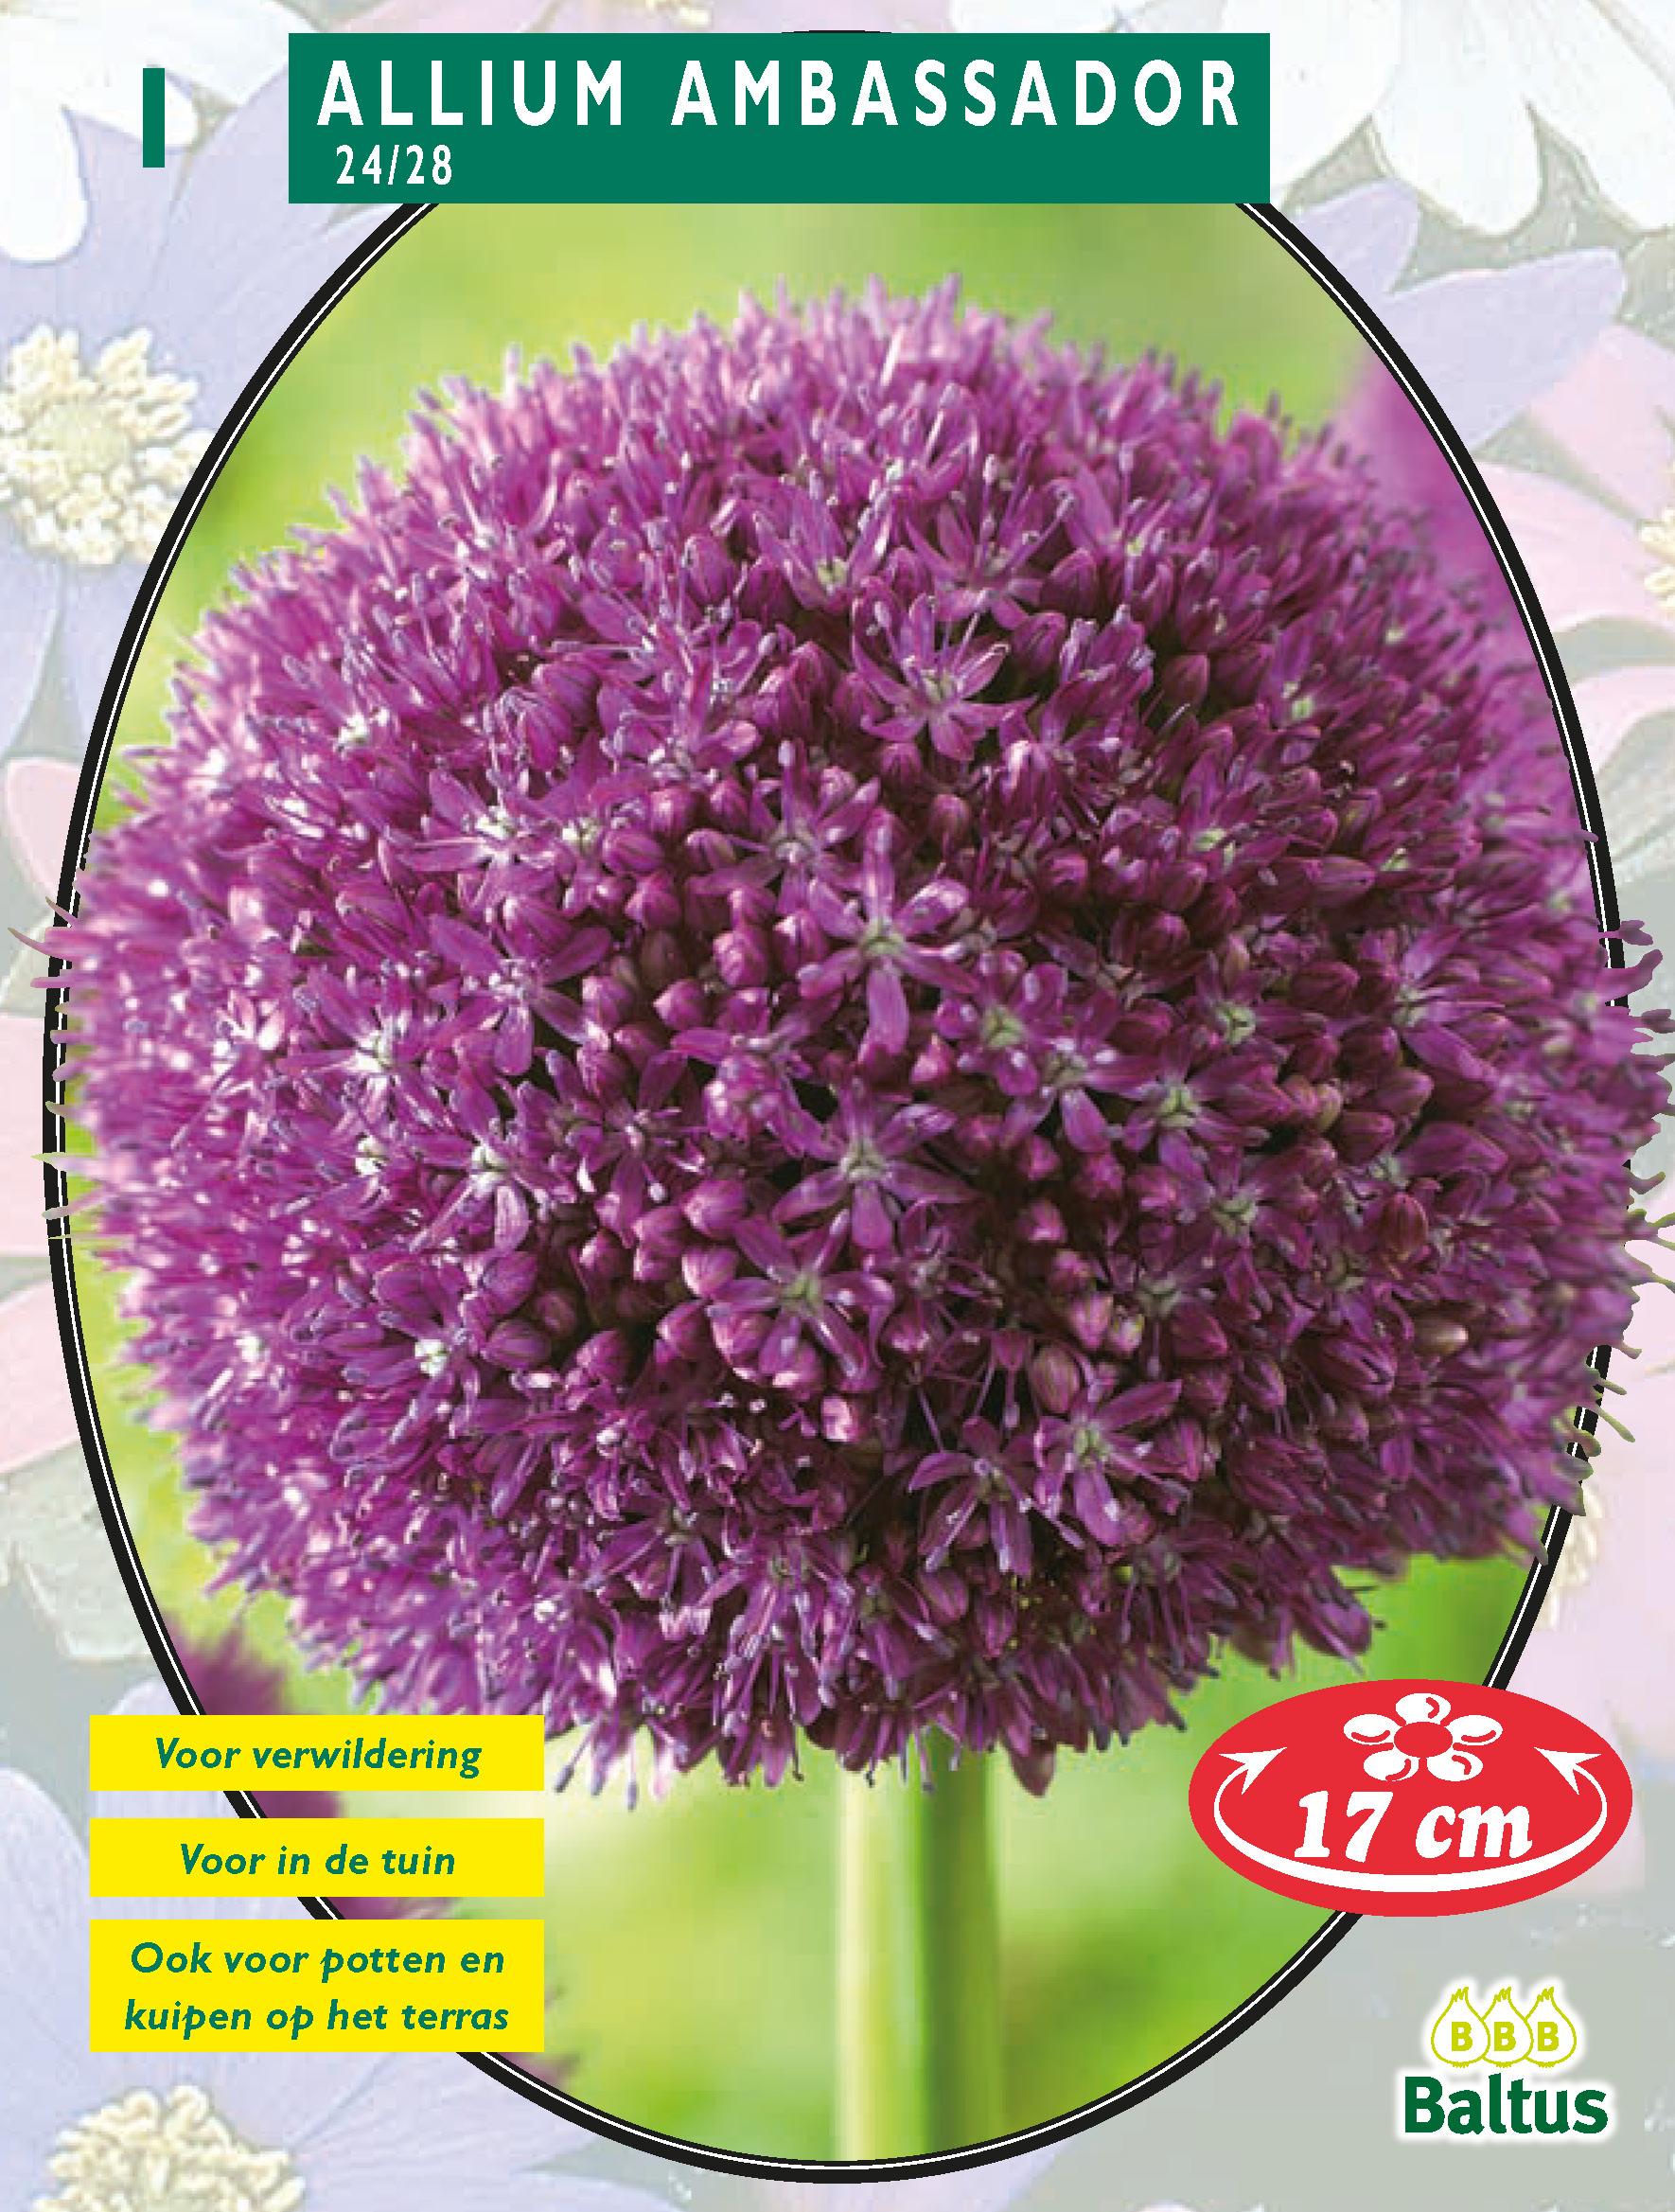 b657f1add 31, 35, Allium Ambassador per ...